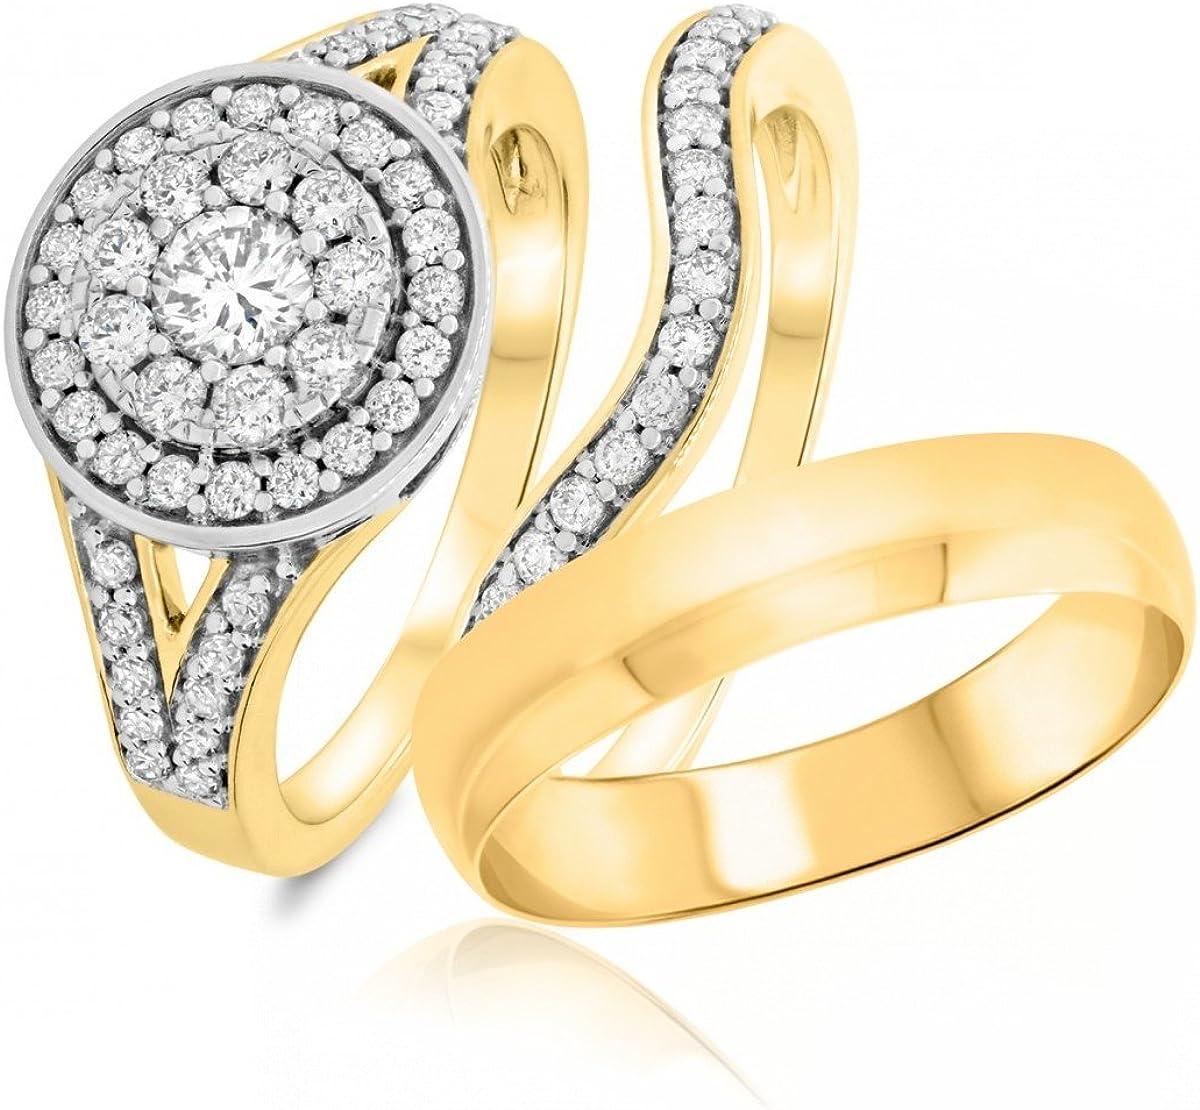 Silvercartvila 1 Ct Sim Diamond Engagement Mens Ladies Ring Fashion Directly managed store Tr